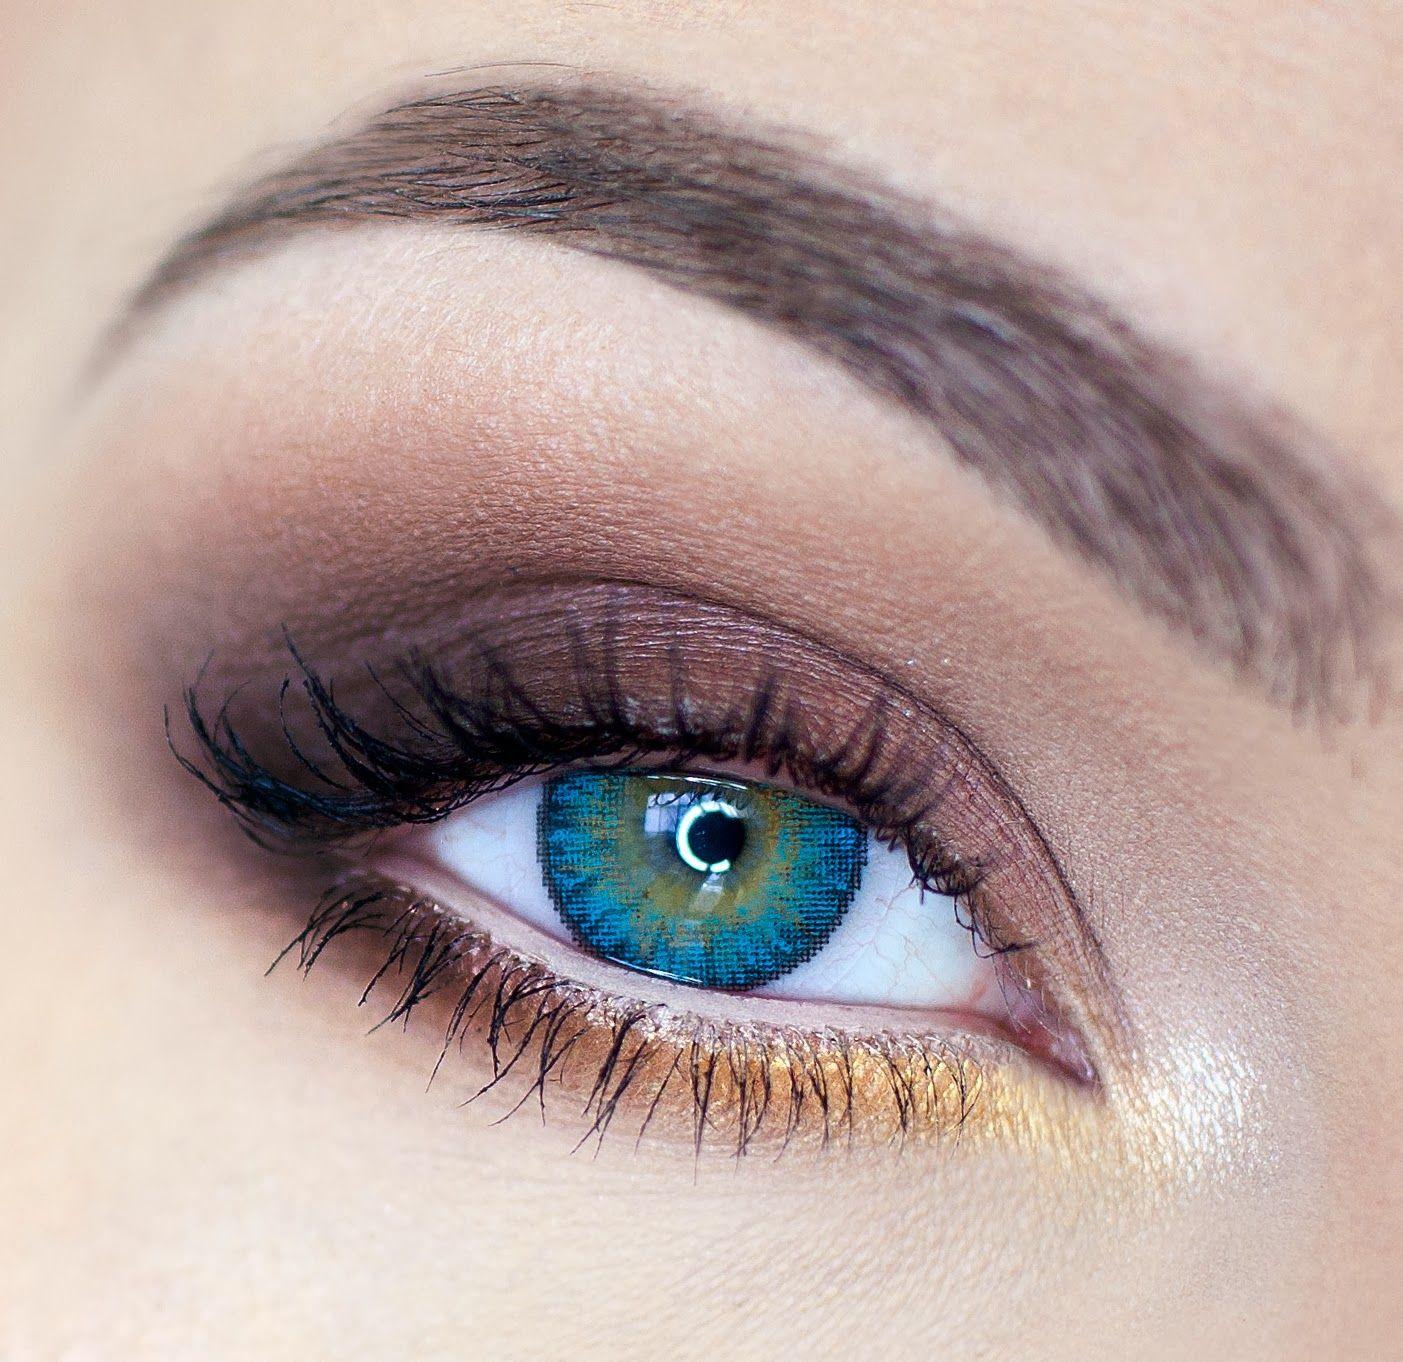 Buy Freshlook Colorblends Dailies Contacts Eyecandy S Cosmetic Contact Lenses Eye Makeup Makeup